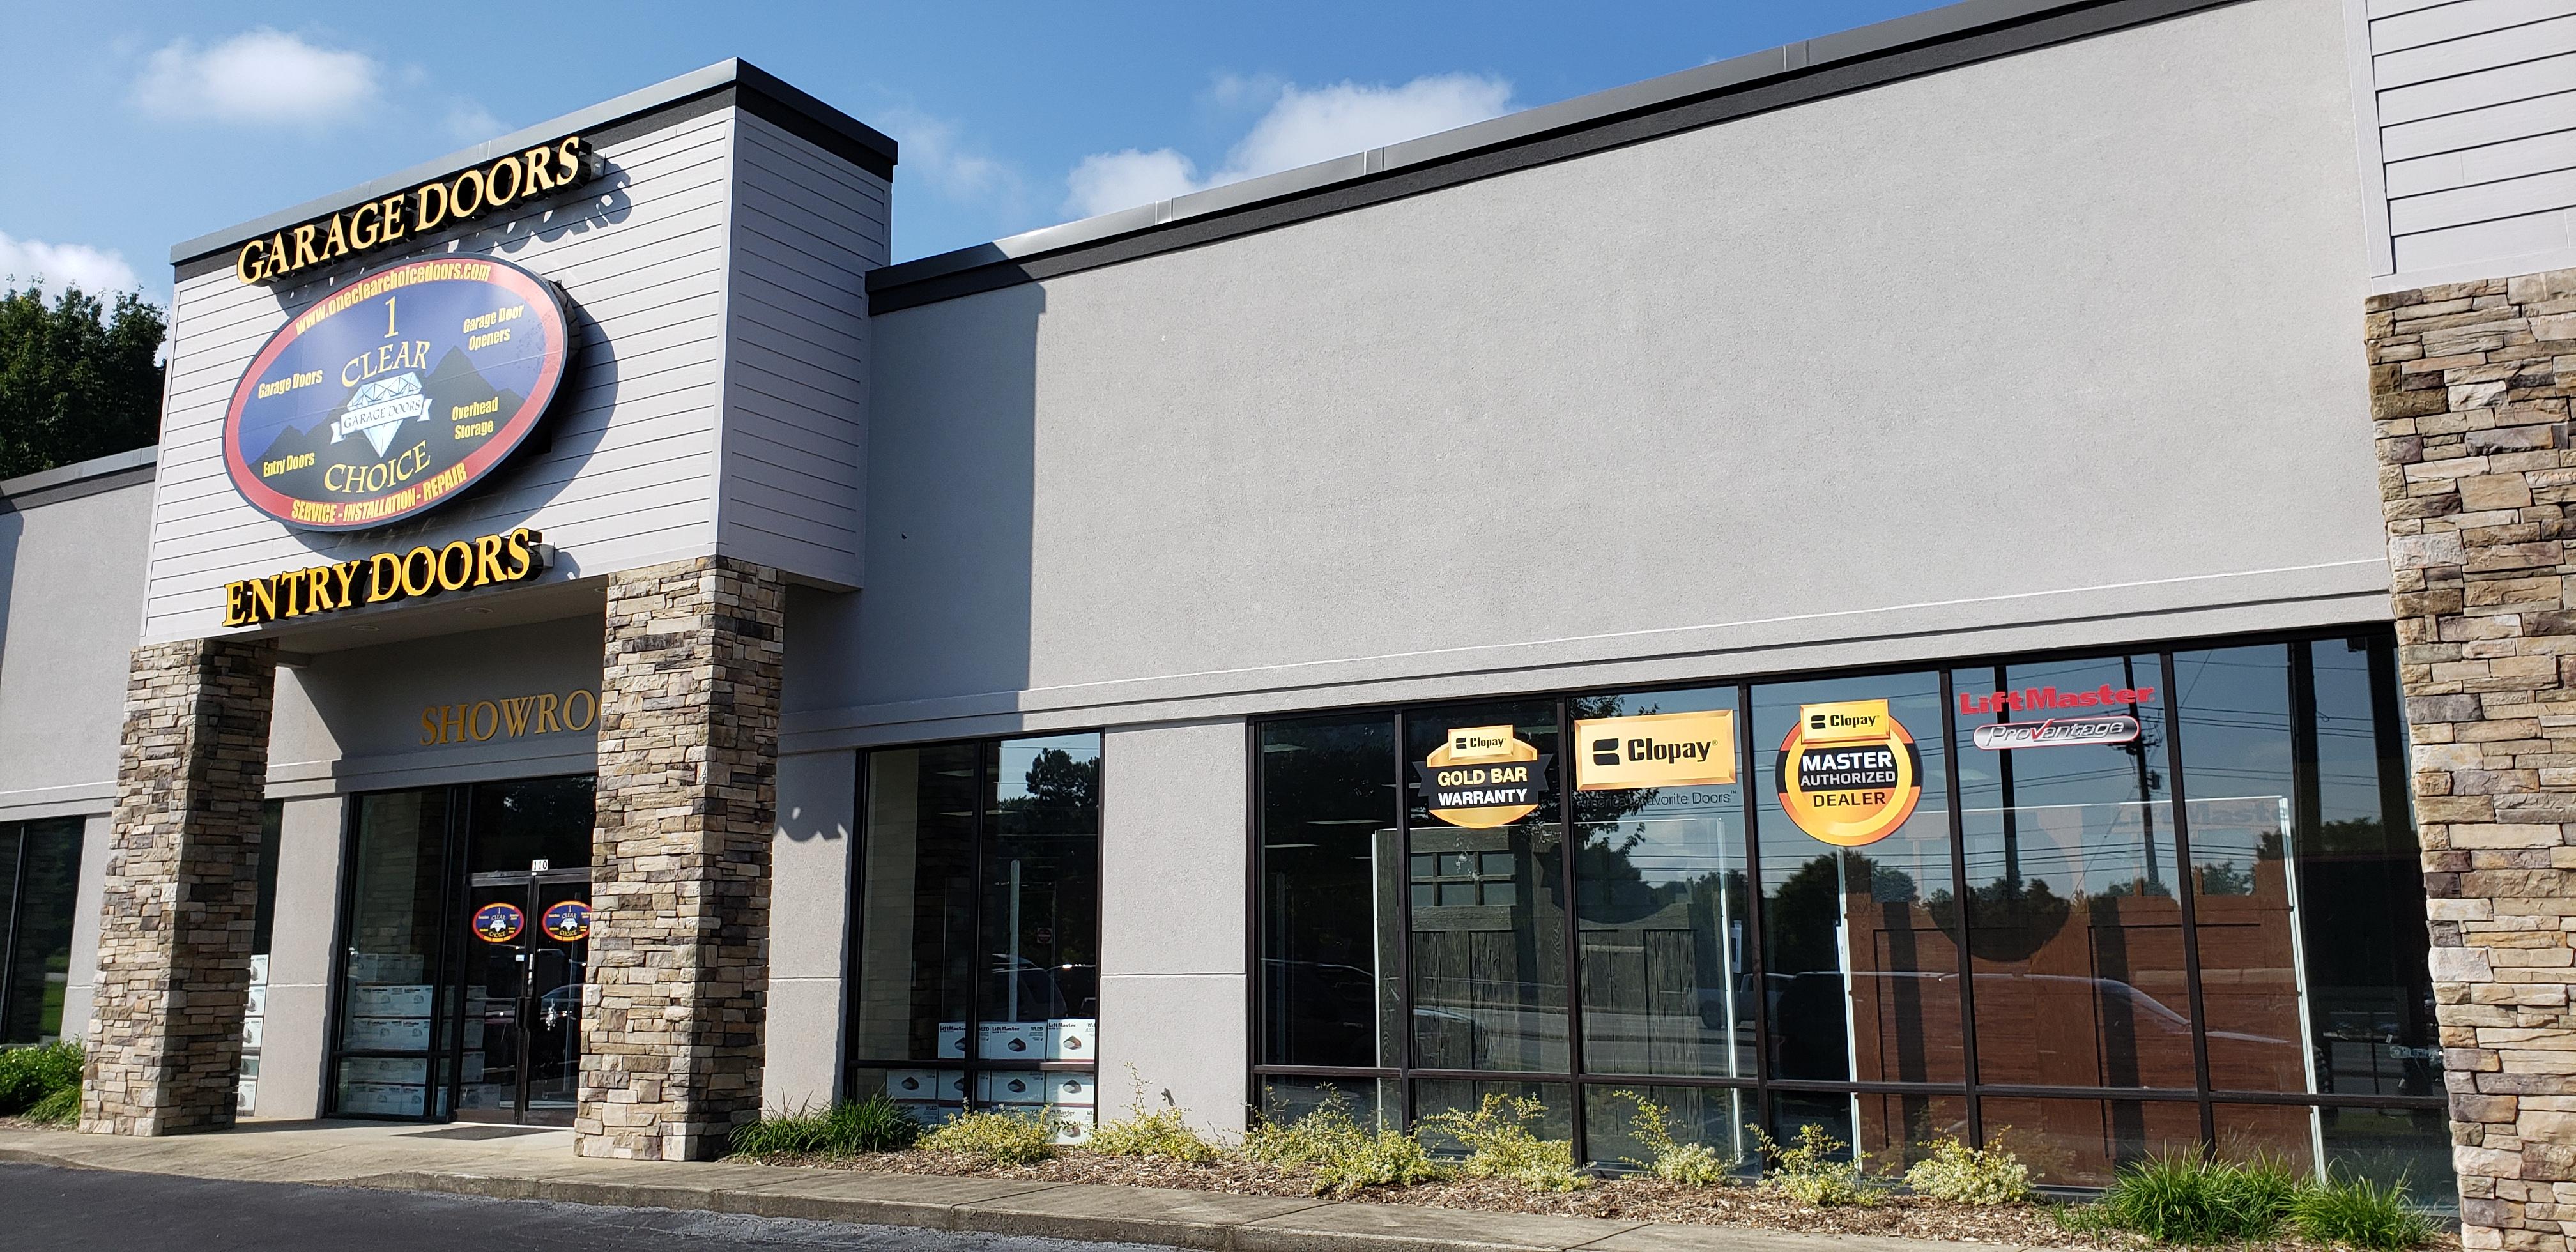 New Garage Door Pricing For Installation Replacement In Atlanta Georgia